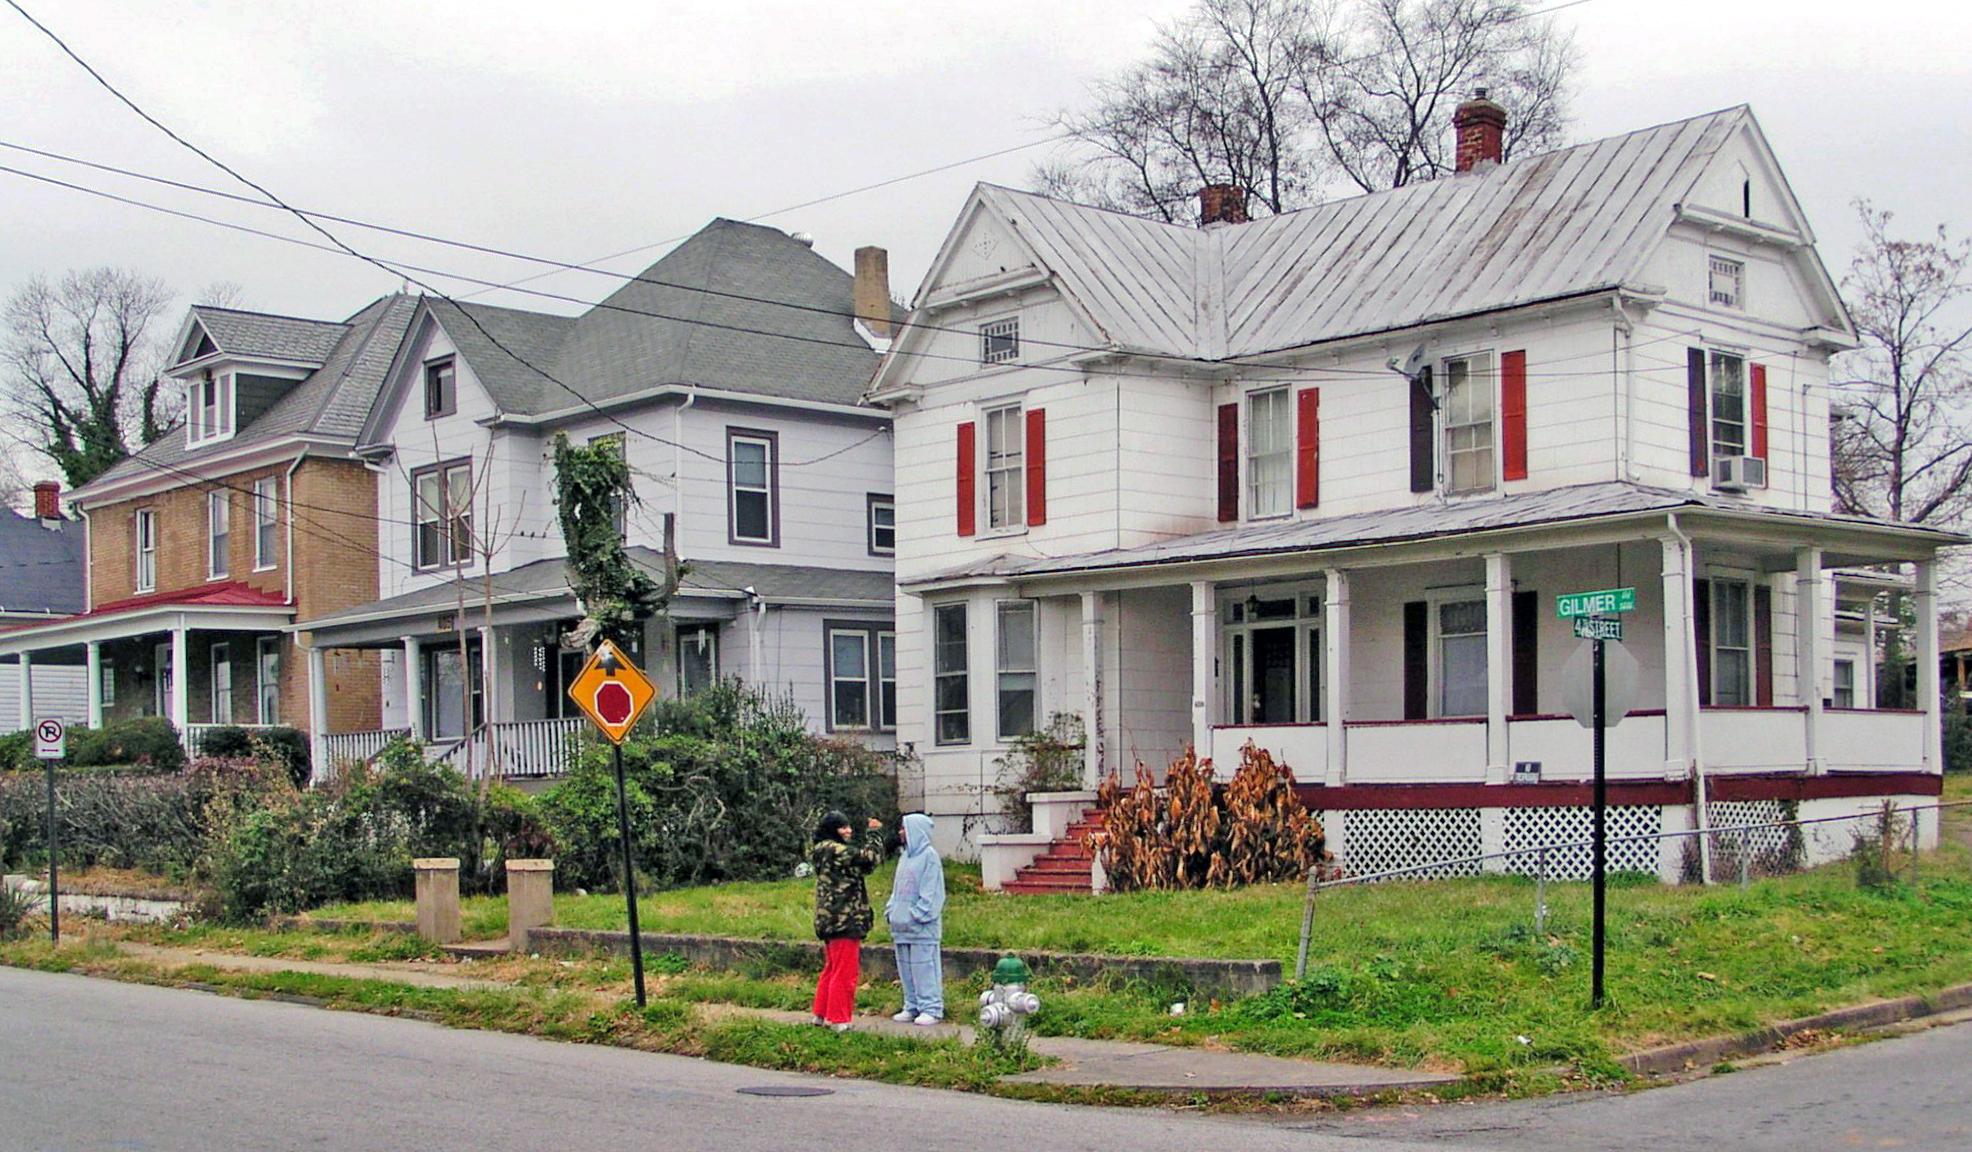 Gainsboro Historic District